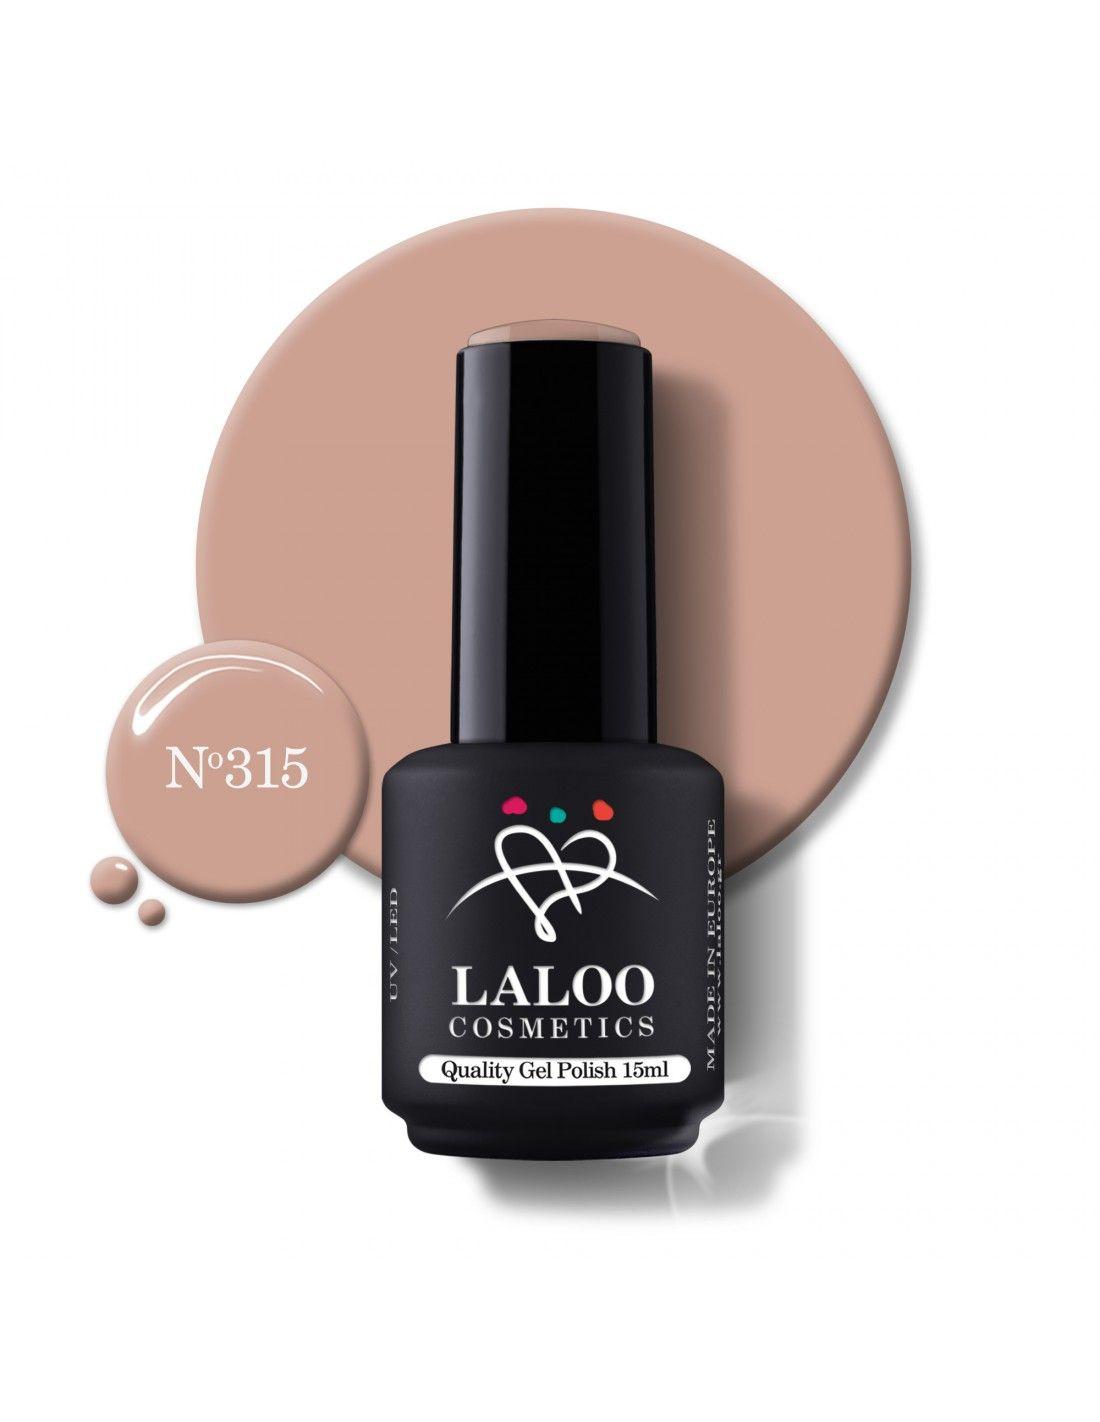 297 Nude Μπεζ-Ροζ   Ημιμόνιμο βερνίκι 15ml   Laloo Cosmetics